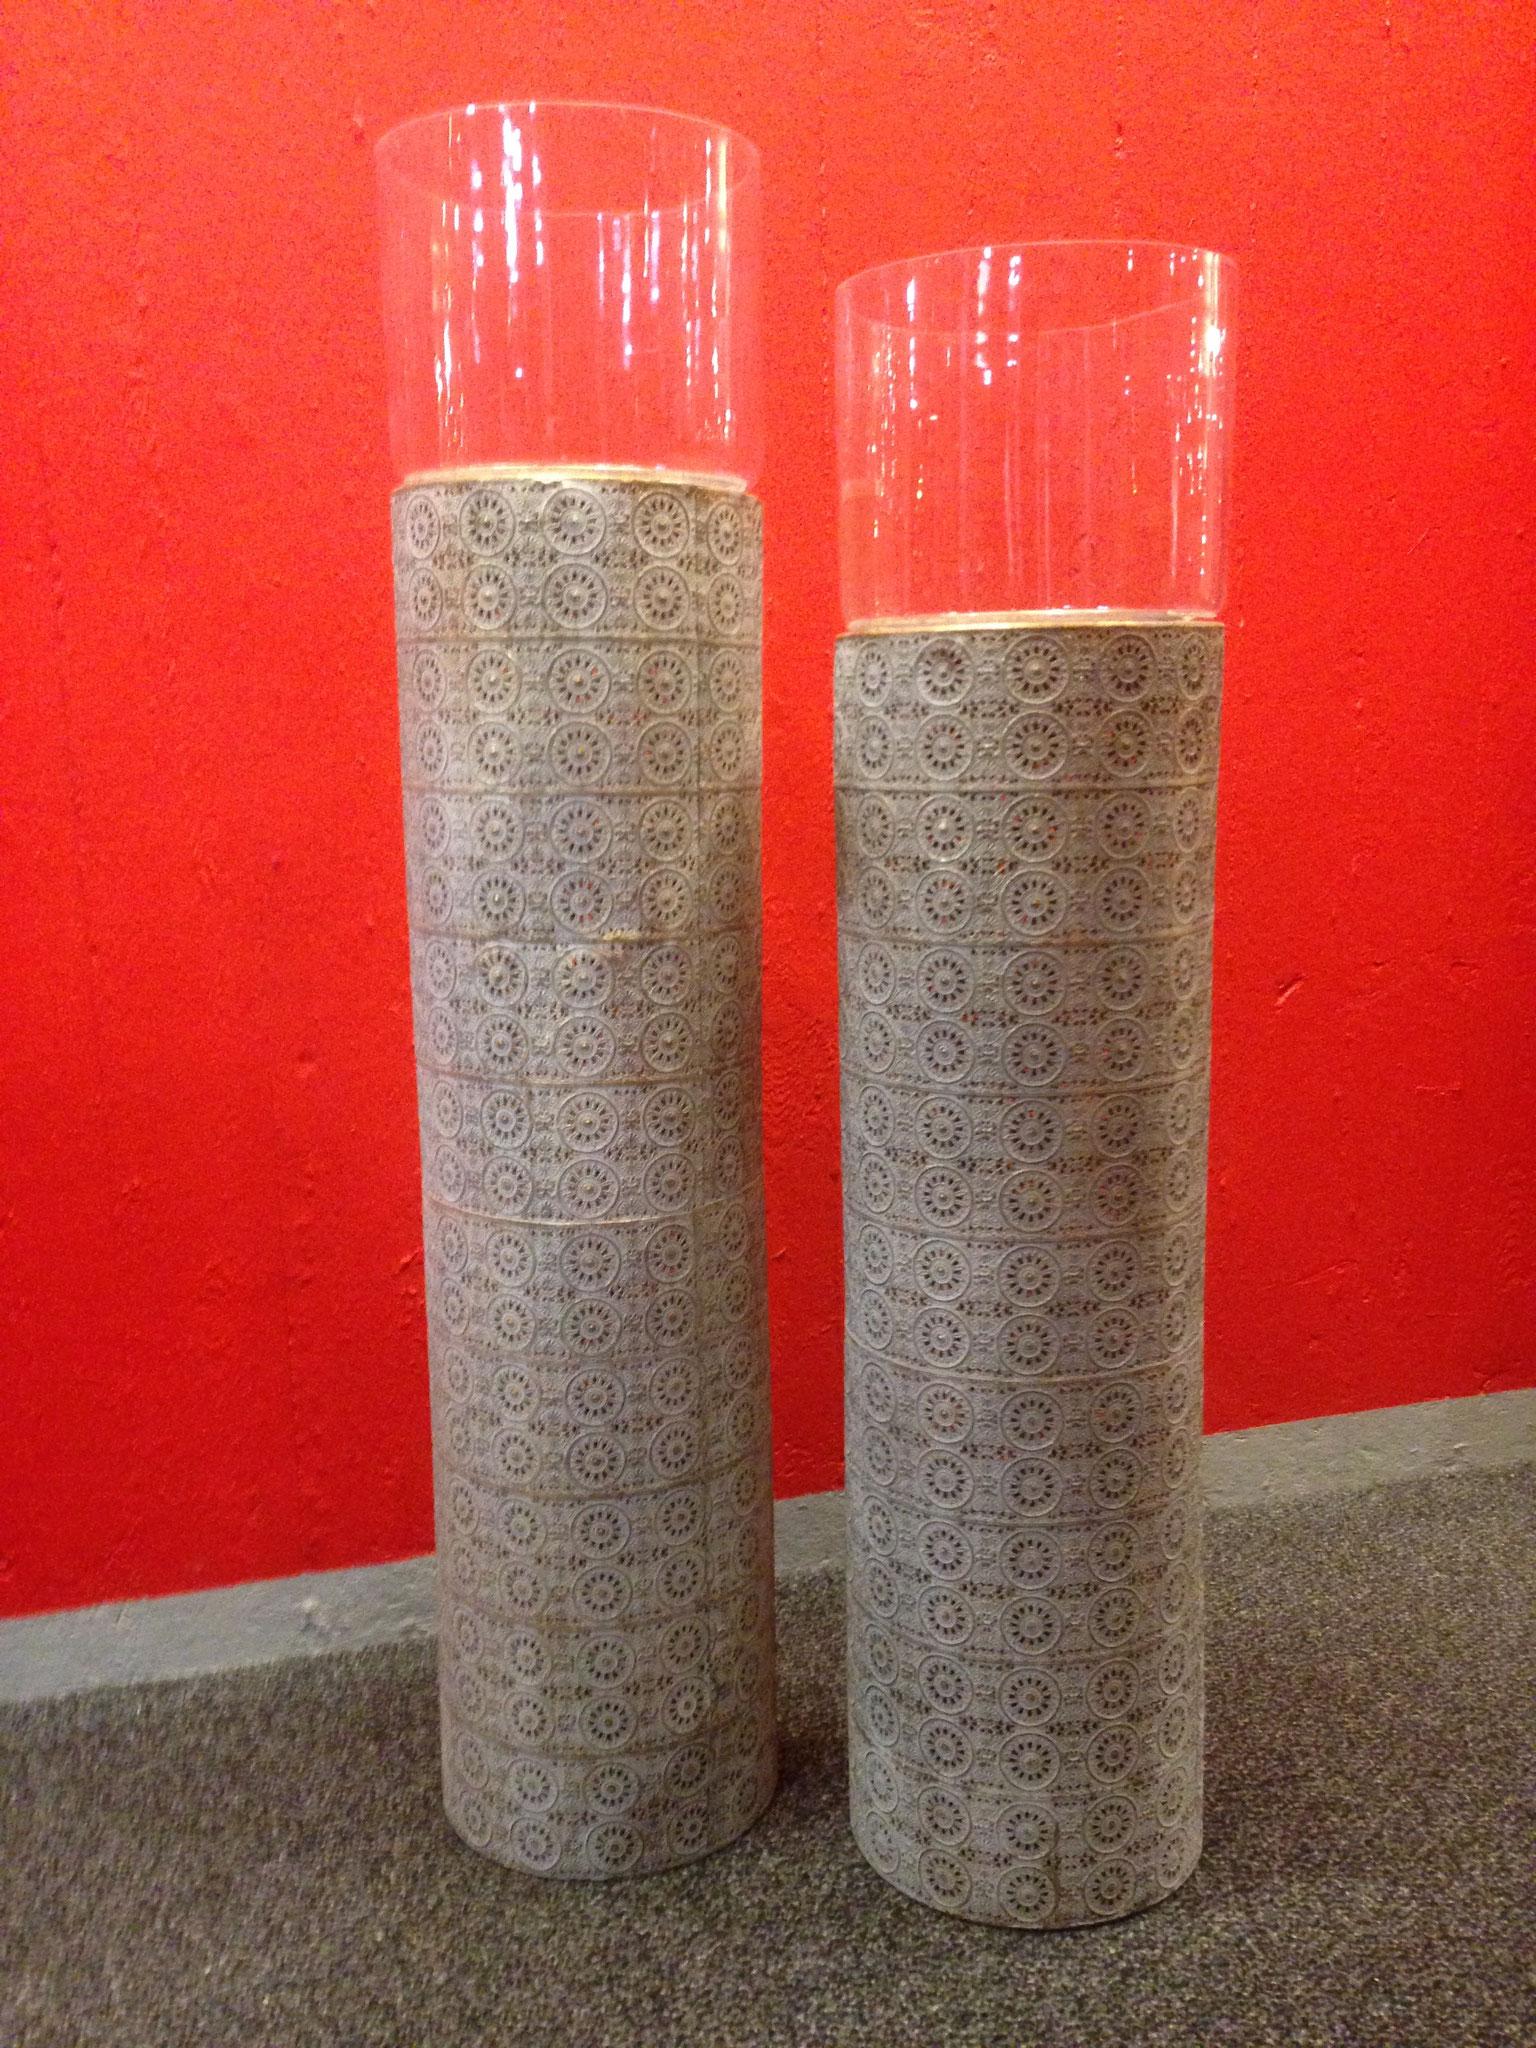 Vasen mit verziertem metall Sockel 094202